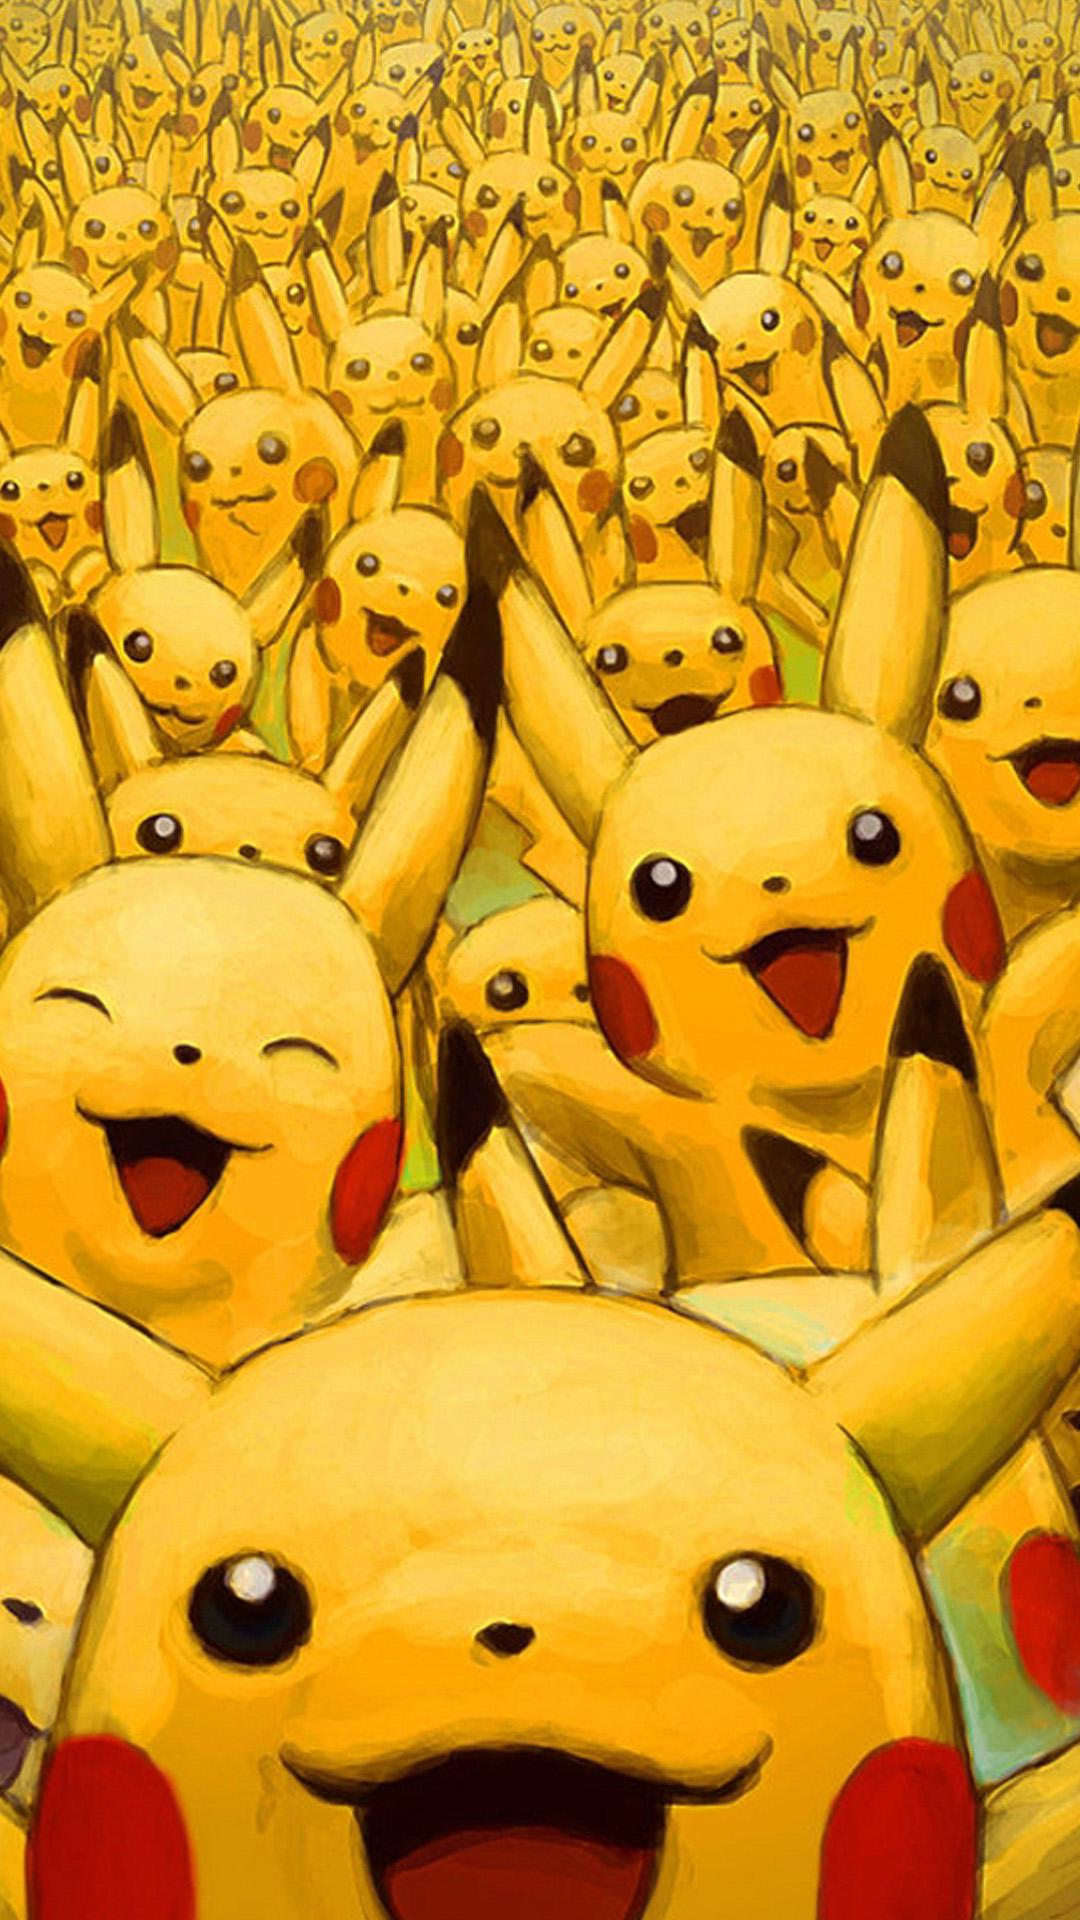 4K Pikachu Wallpaper For IPhone